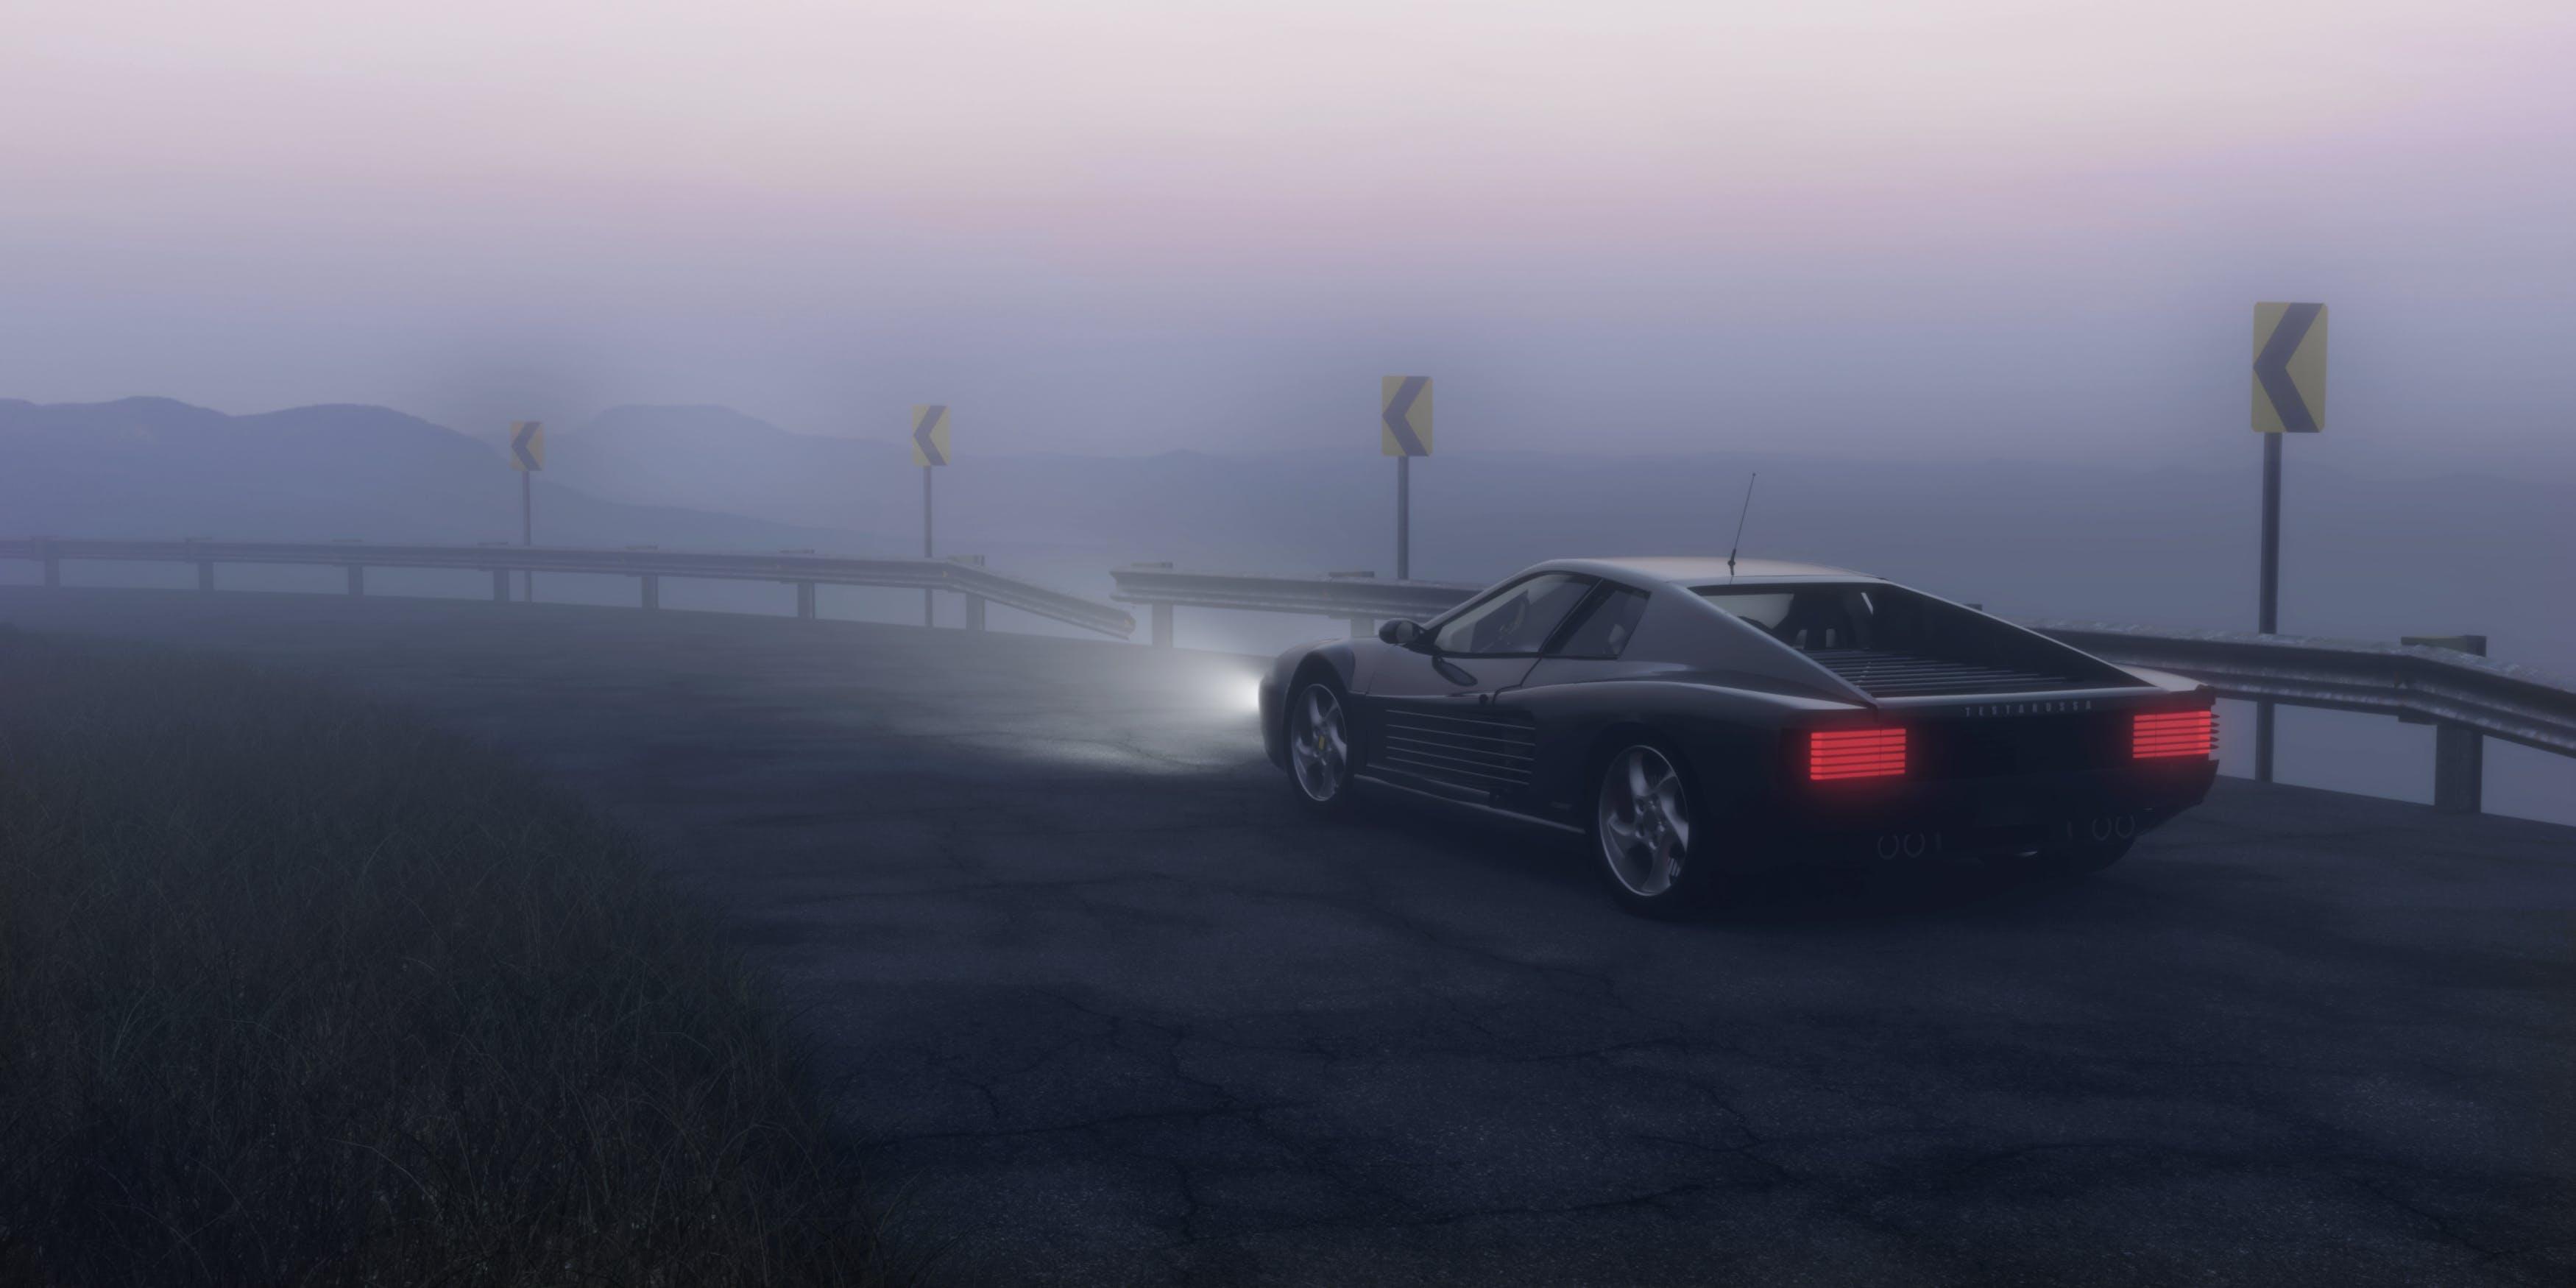 Gratis arkivbilde med asfalt, bevegelse, bil, bue